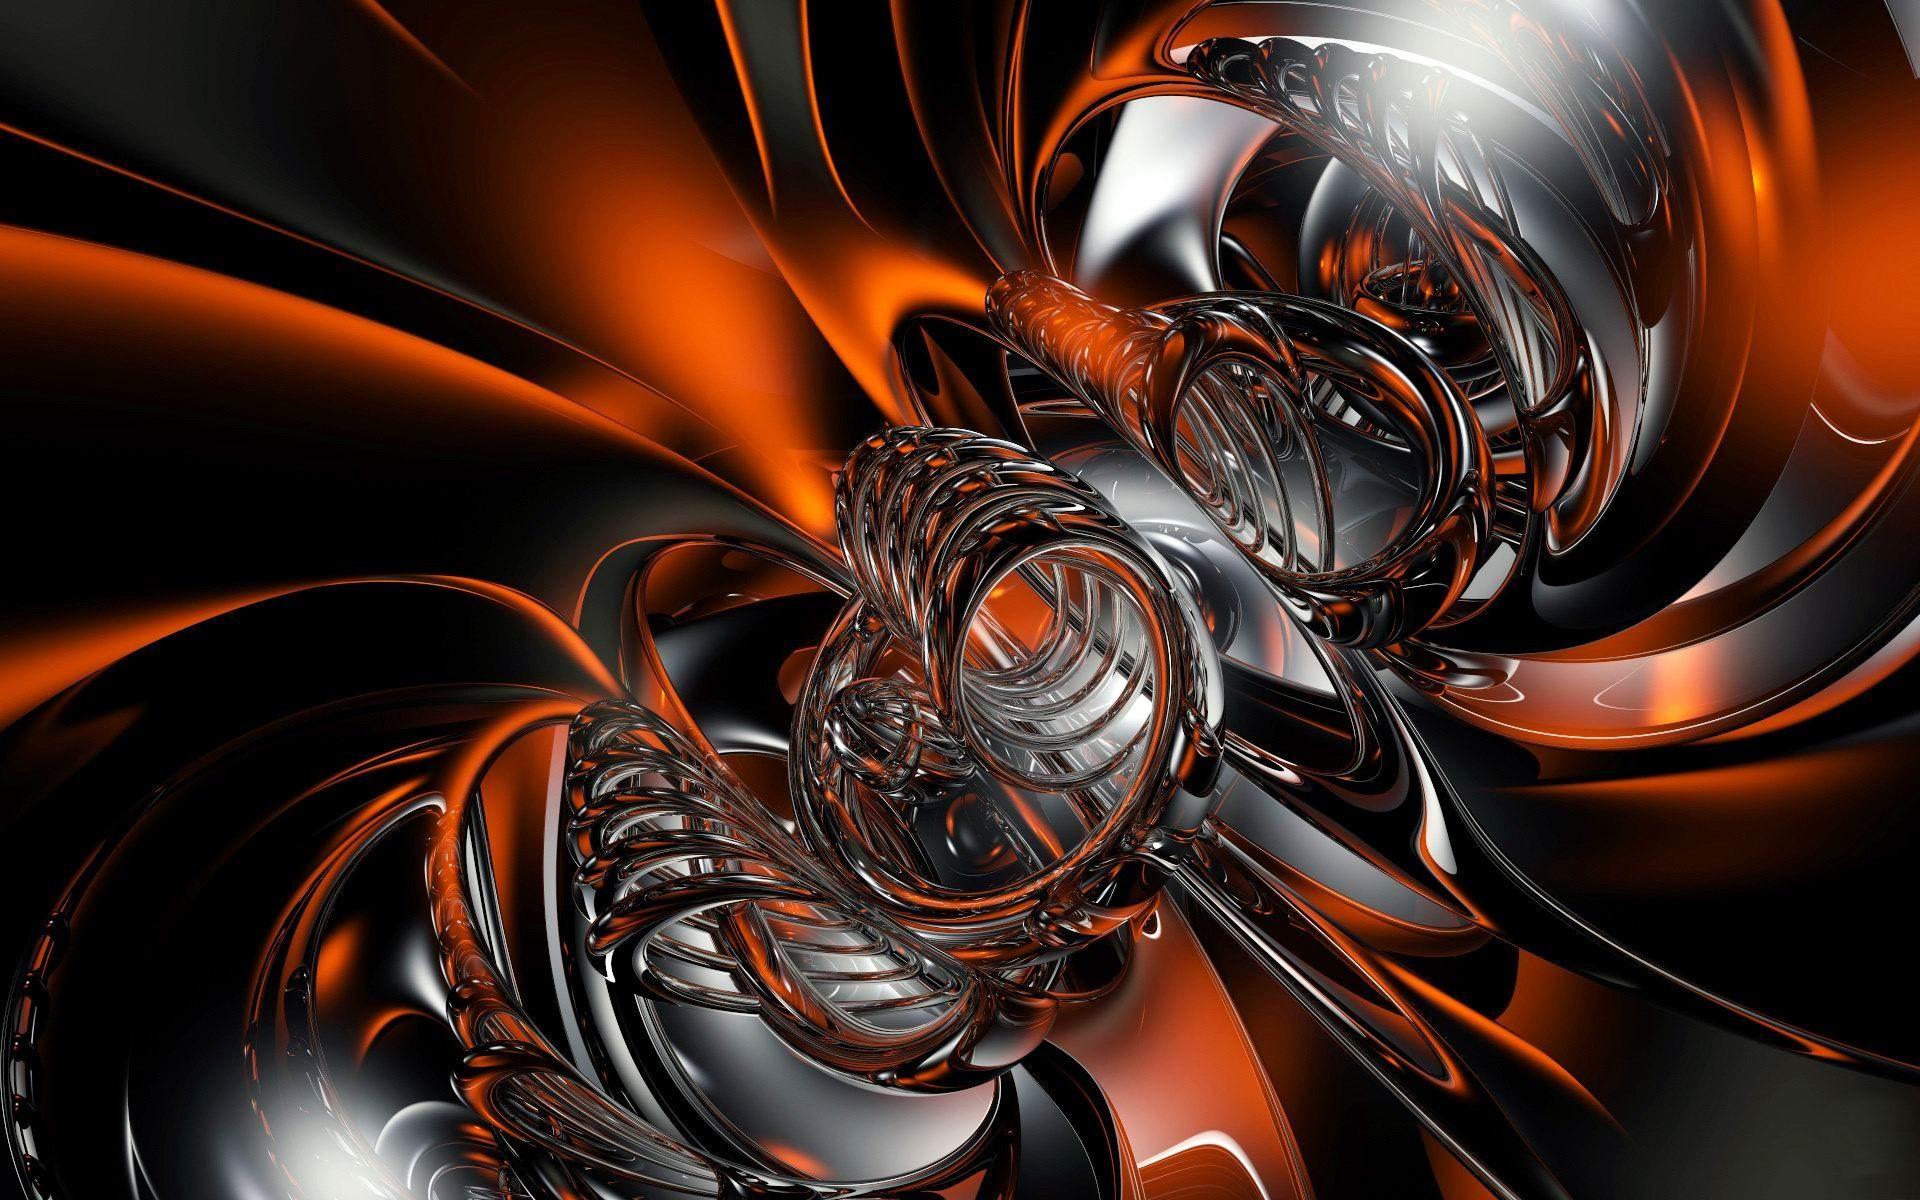 Cool 3D Abstract HD Widescreen Wallpaper 73 – Amazing Wallpaperz